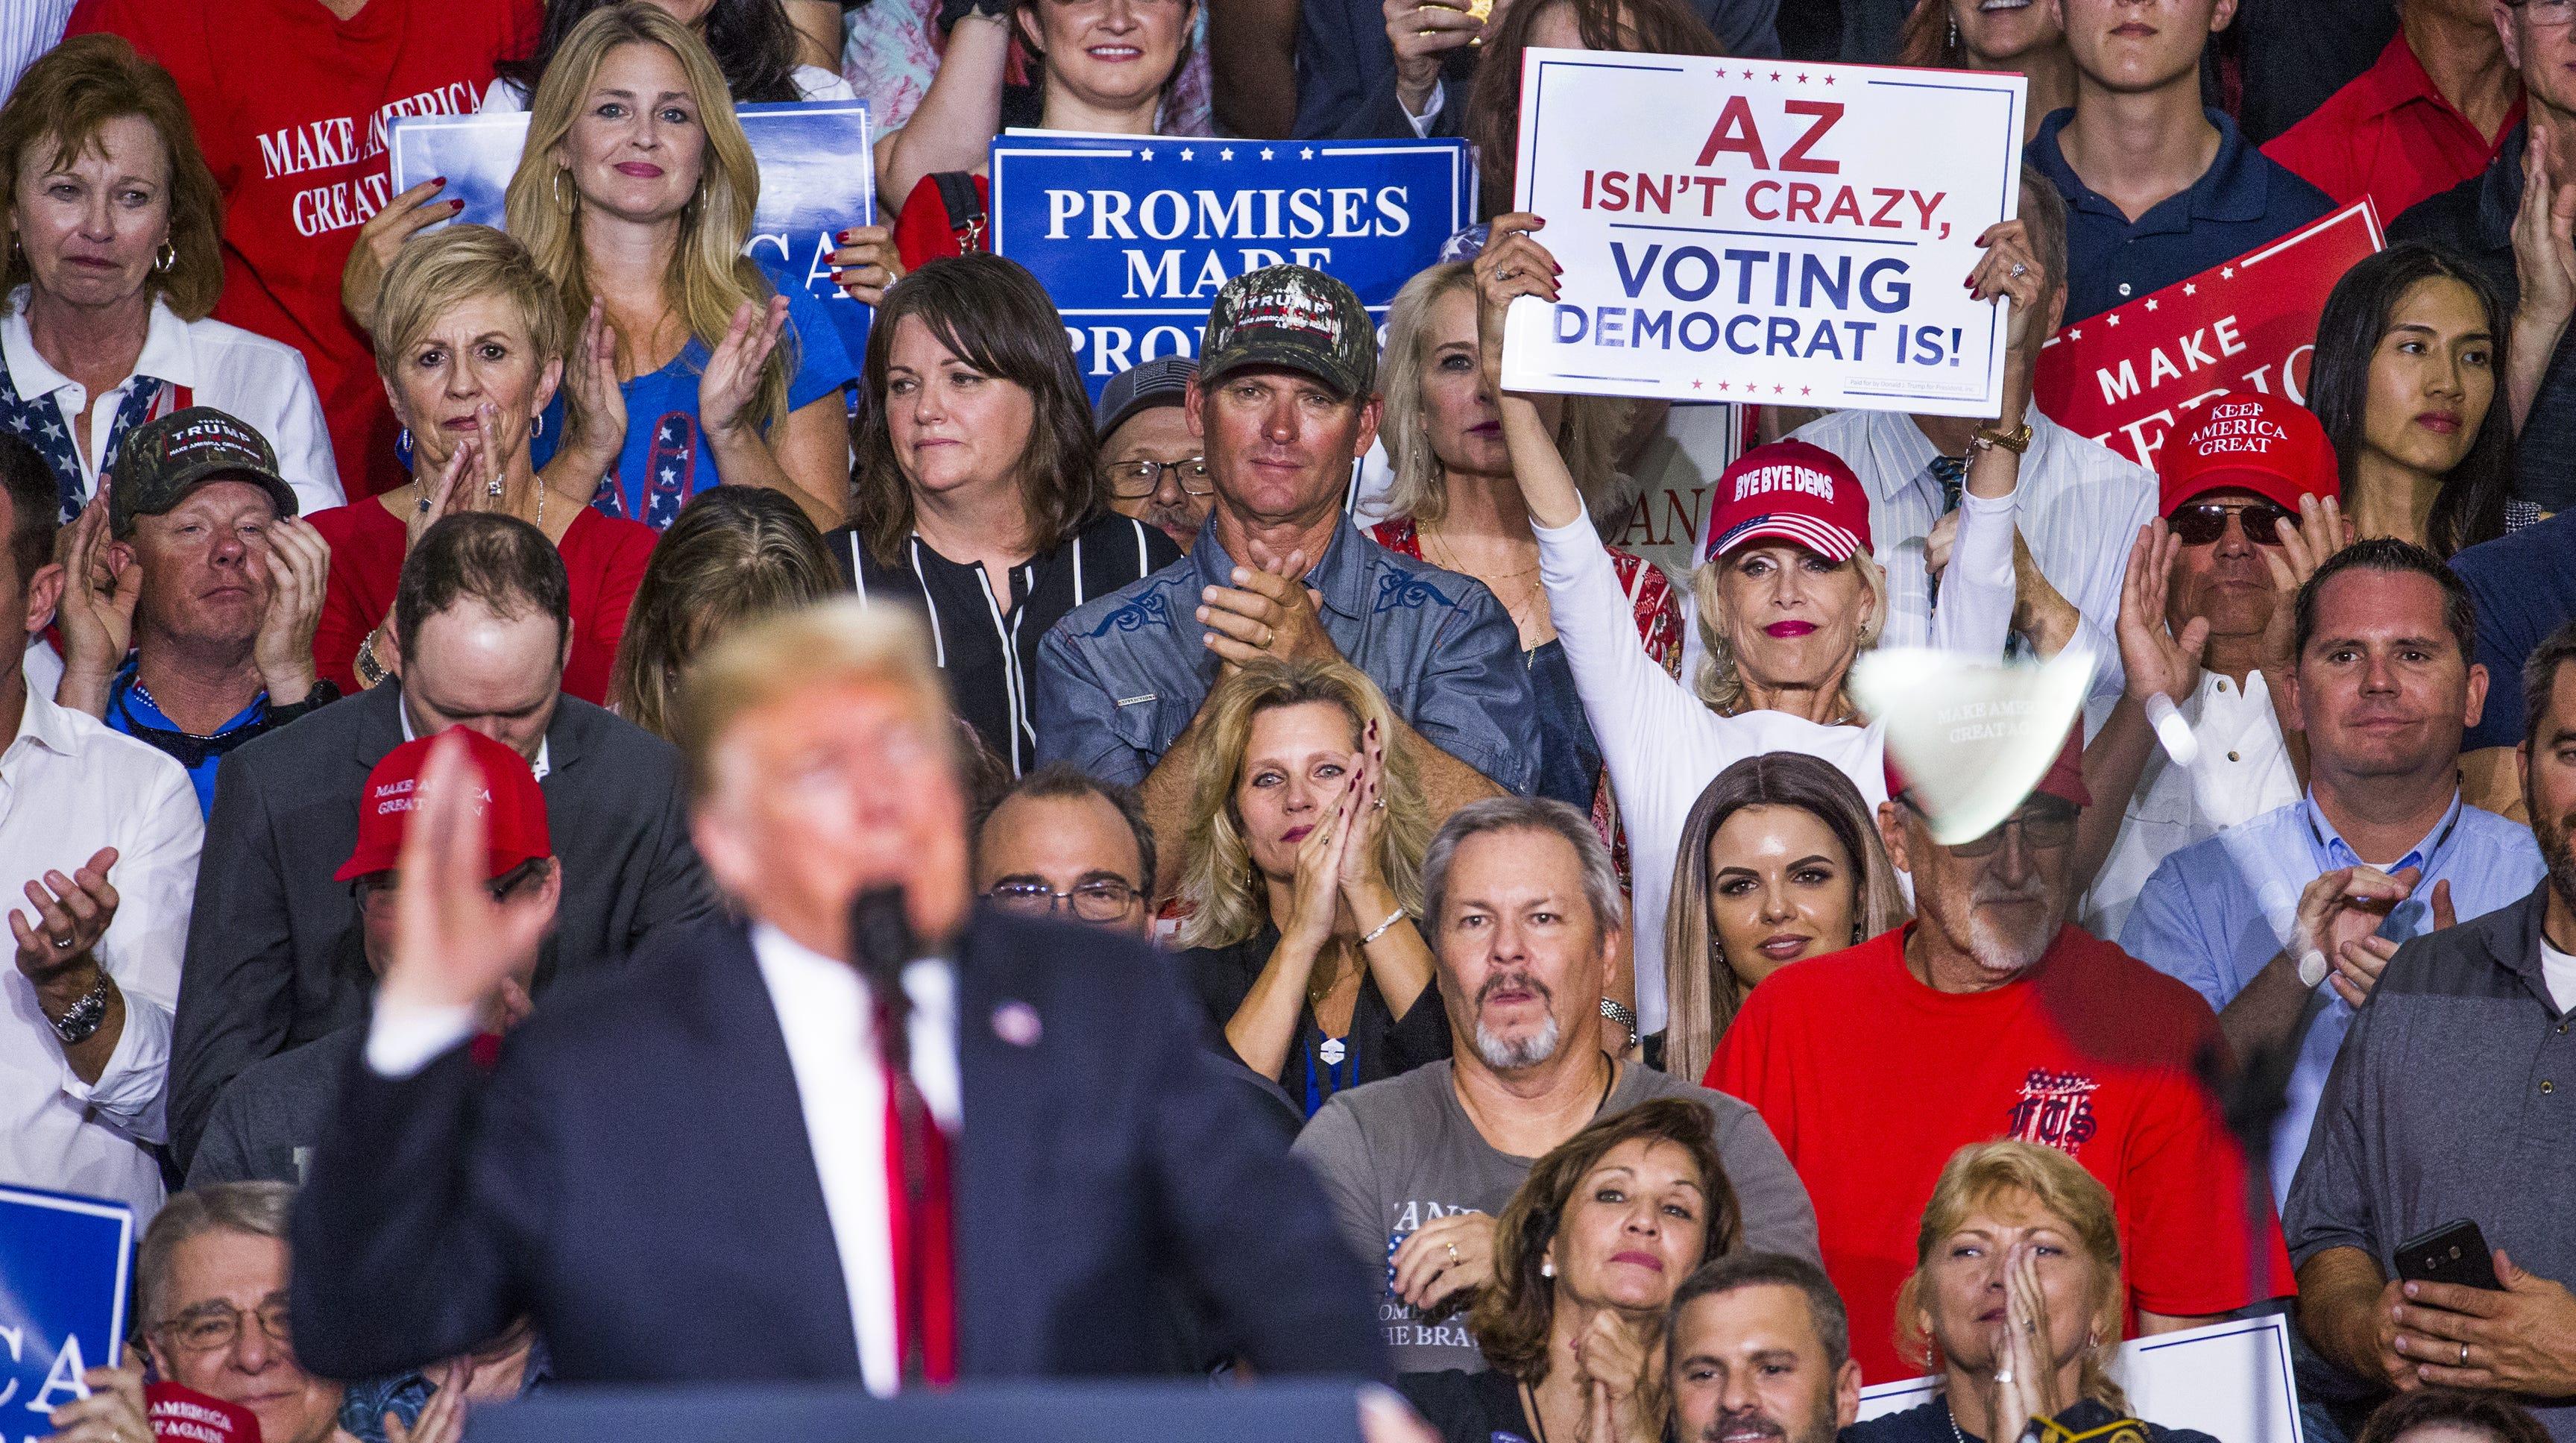 Donald Trump on Arizona: Immigration, Wyatt Earp and 'beautiful women'